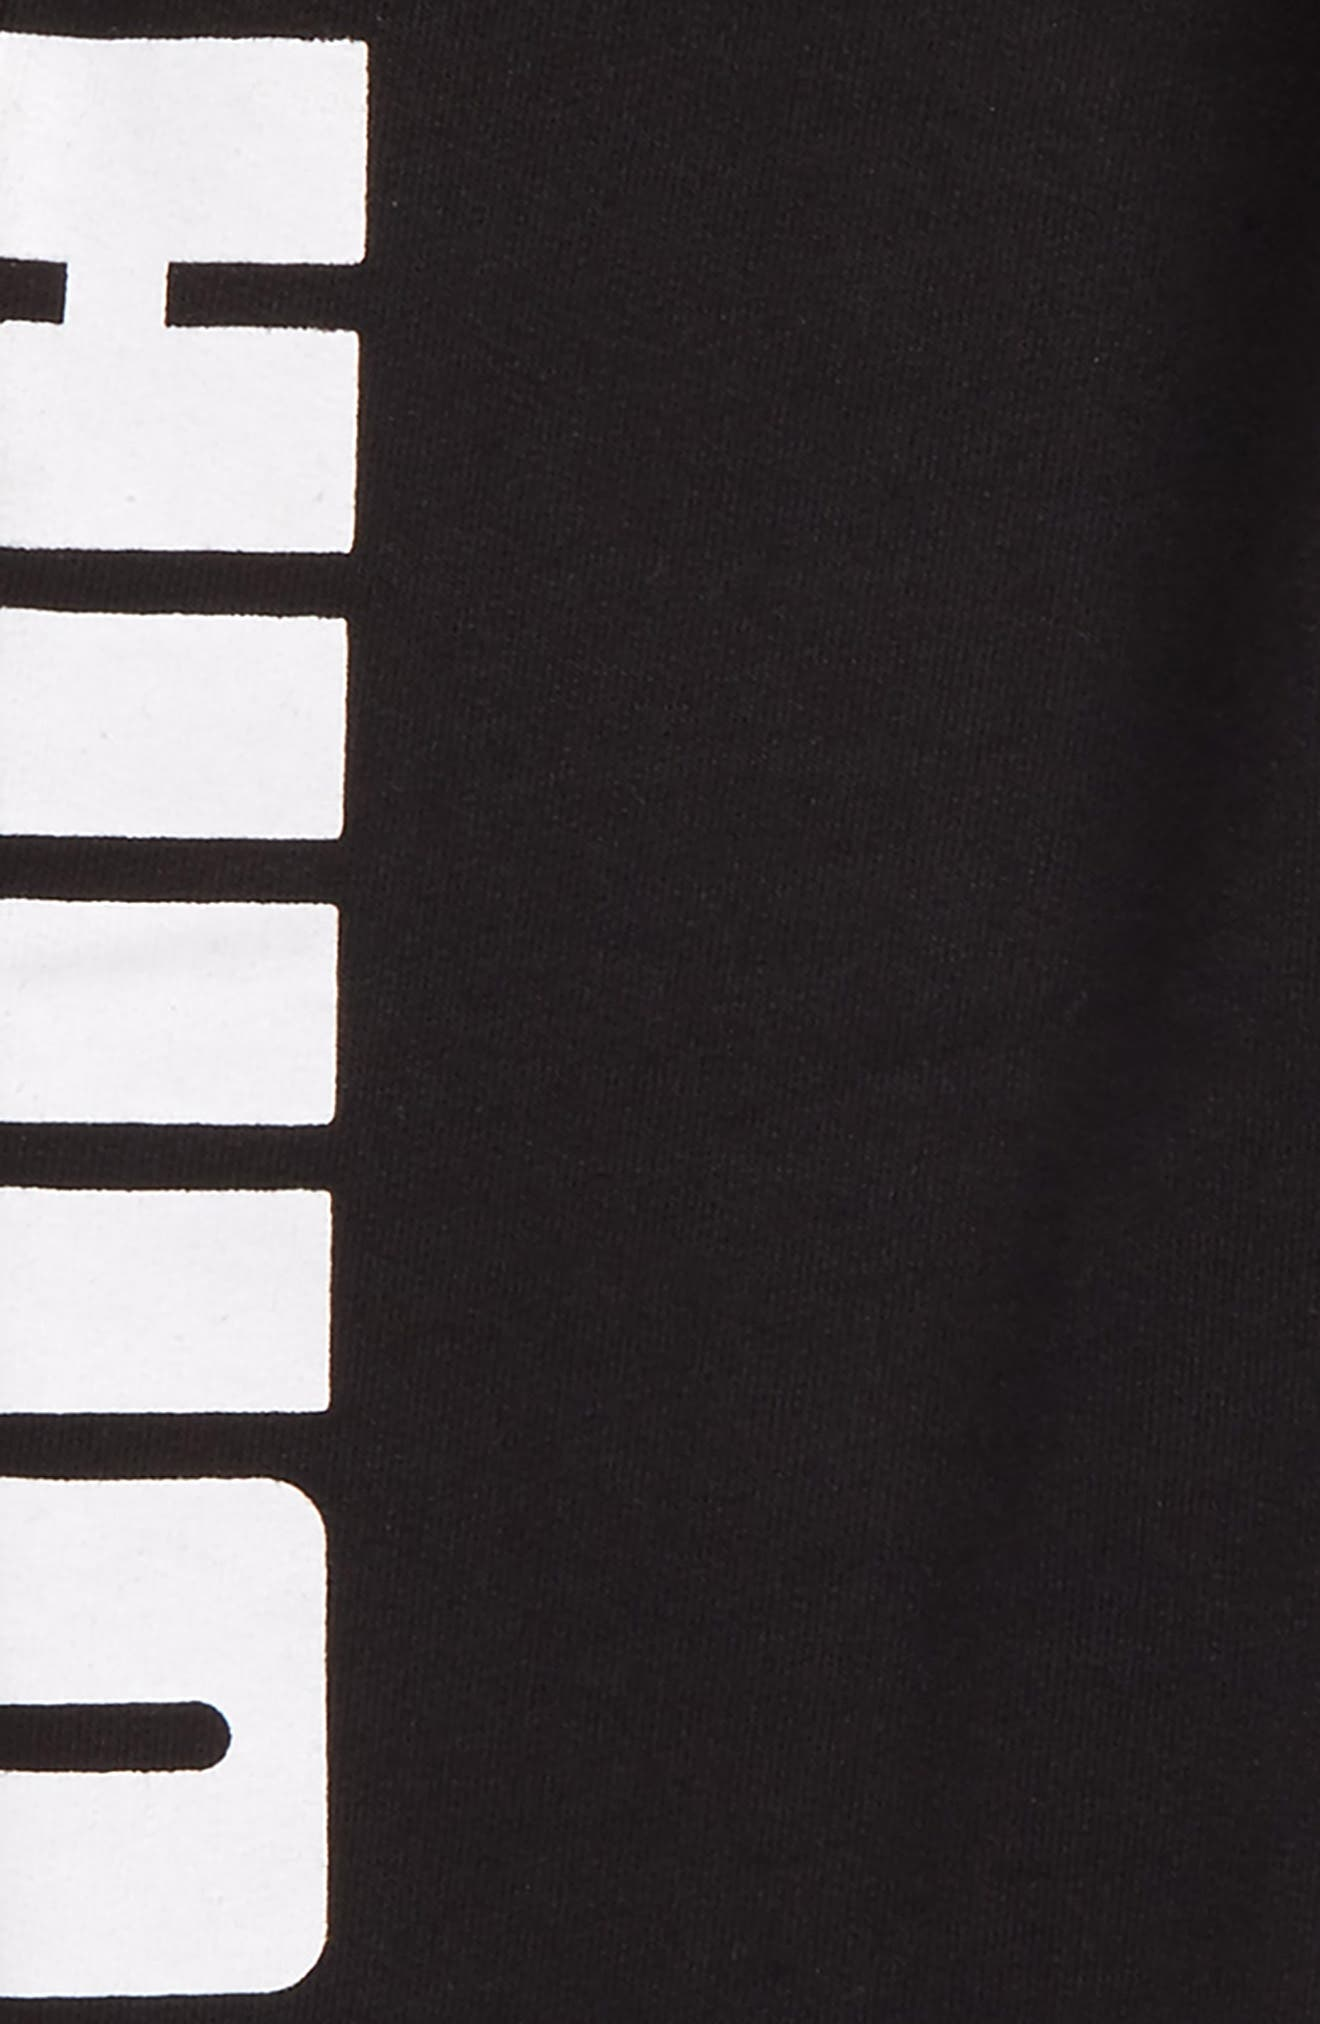 Rebel Jogger Sweatpants,                             Alternate thumbnail 2, color,                             Puma Black